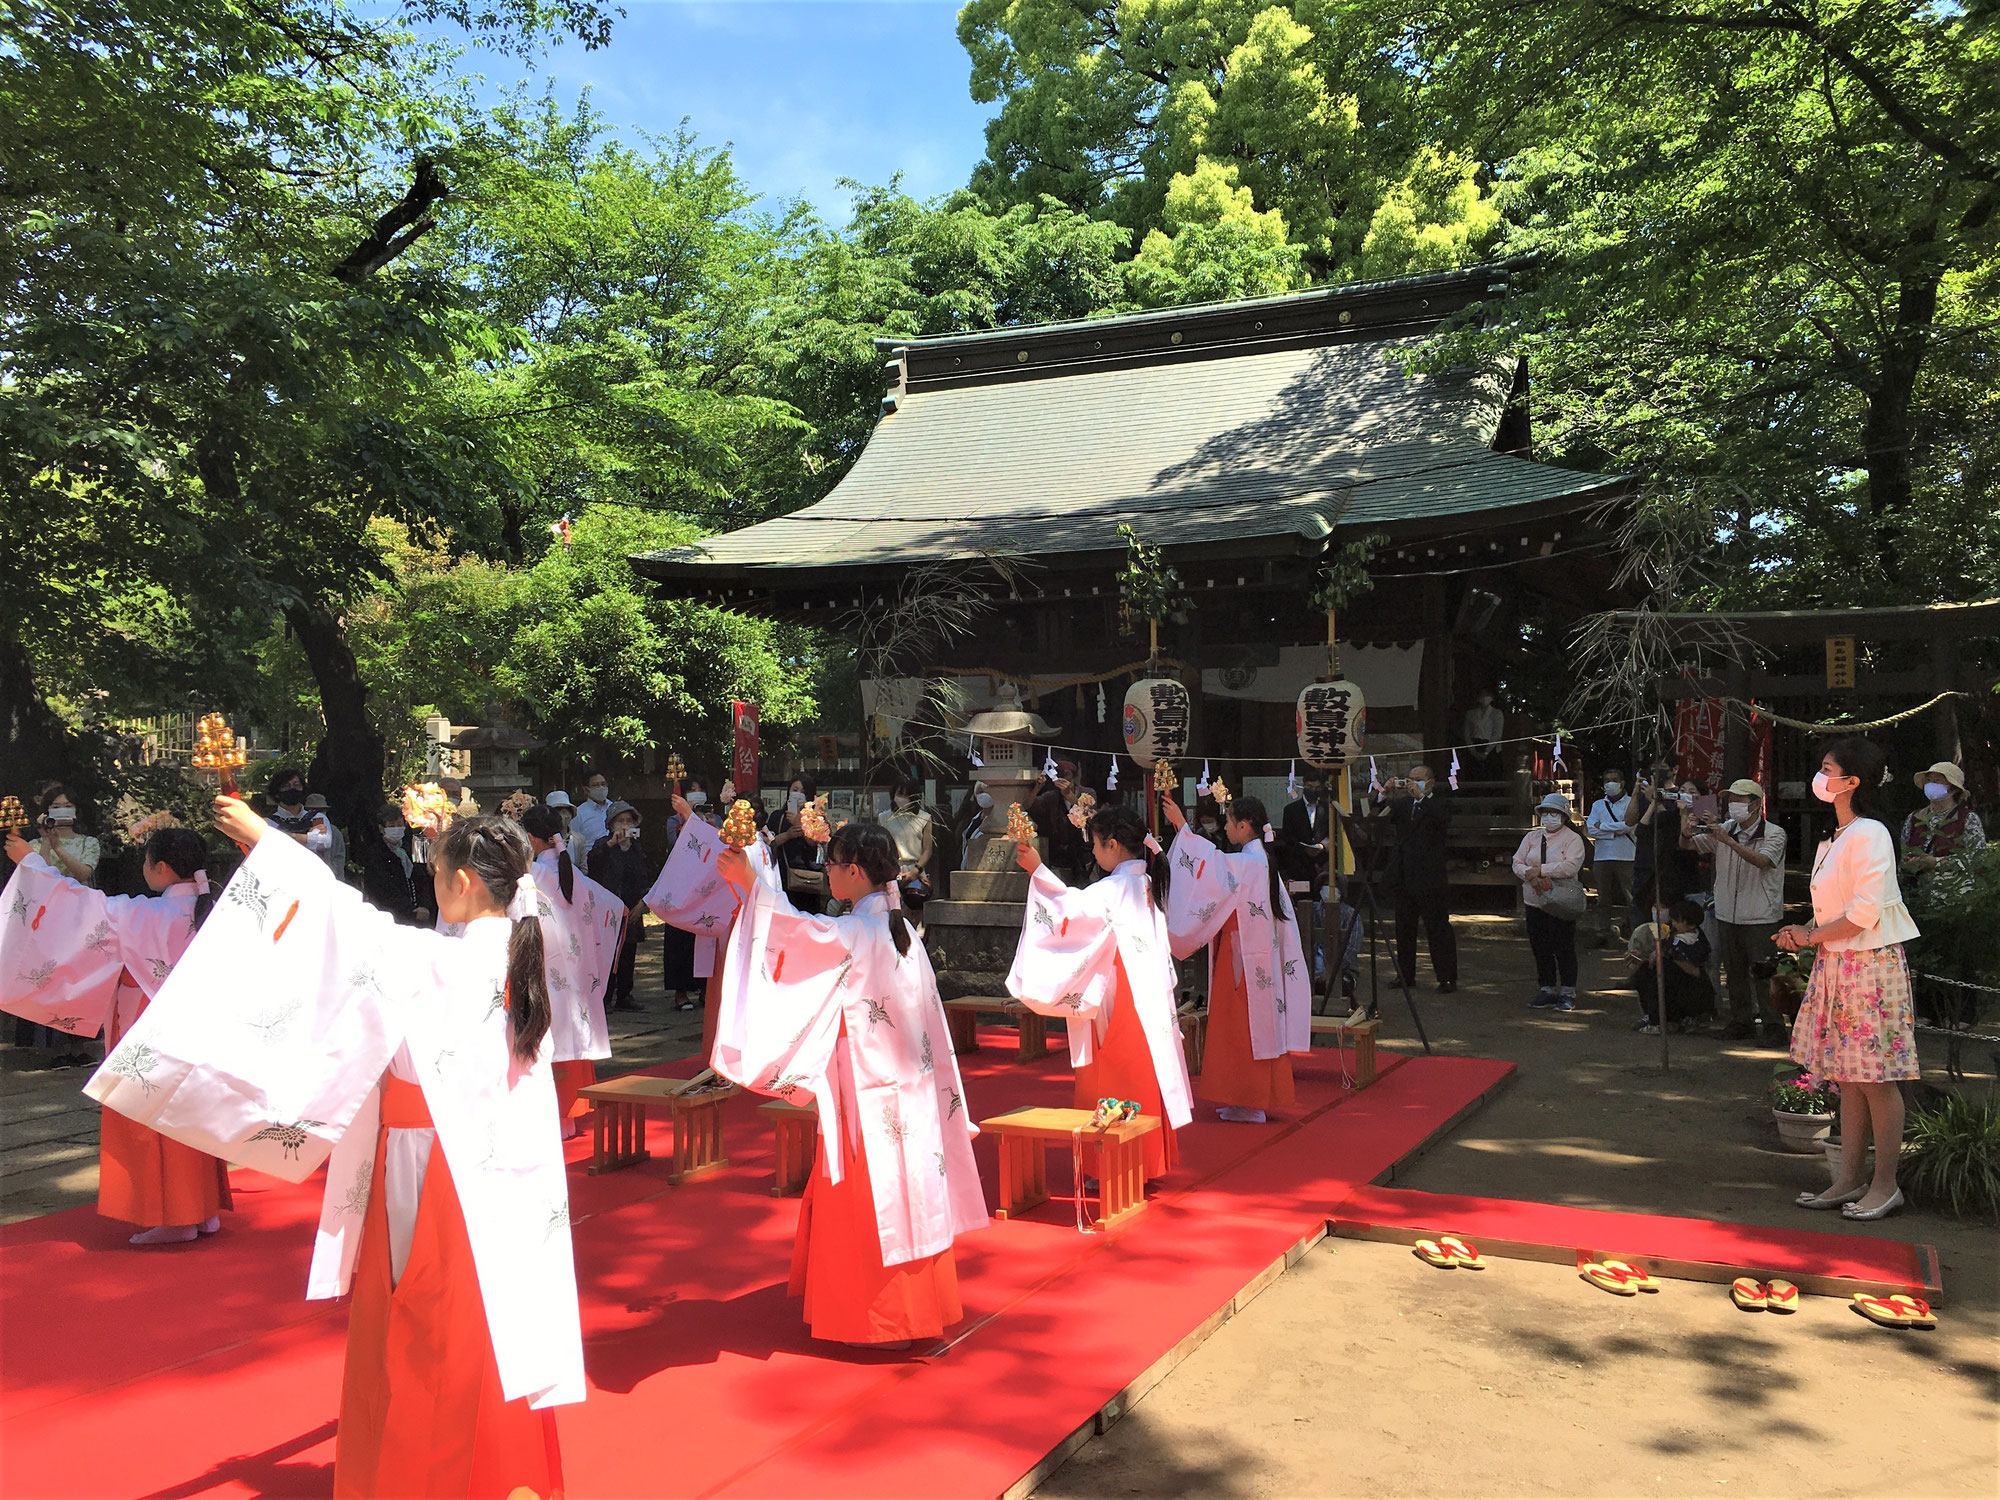 敷島神社例大祭で神楽舞を奉納